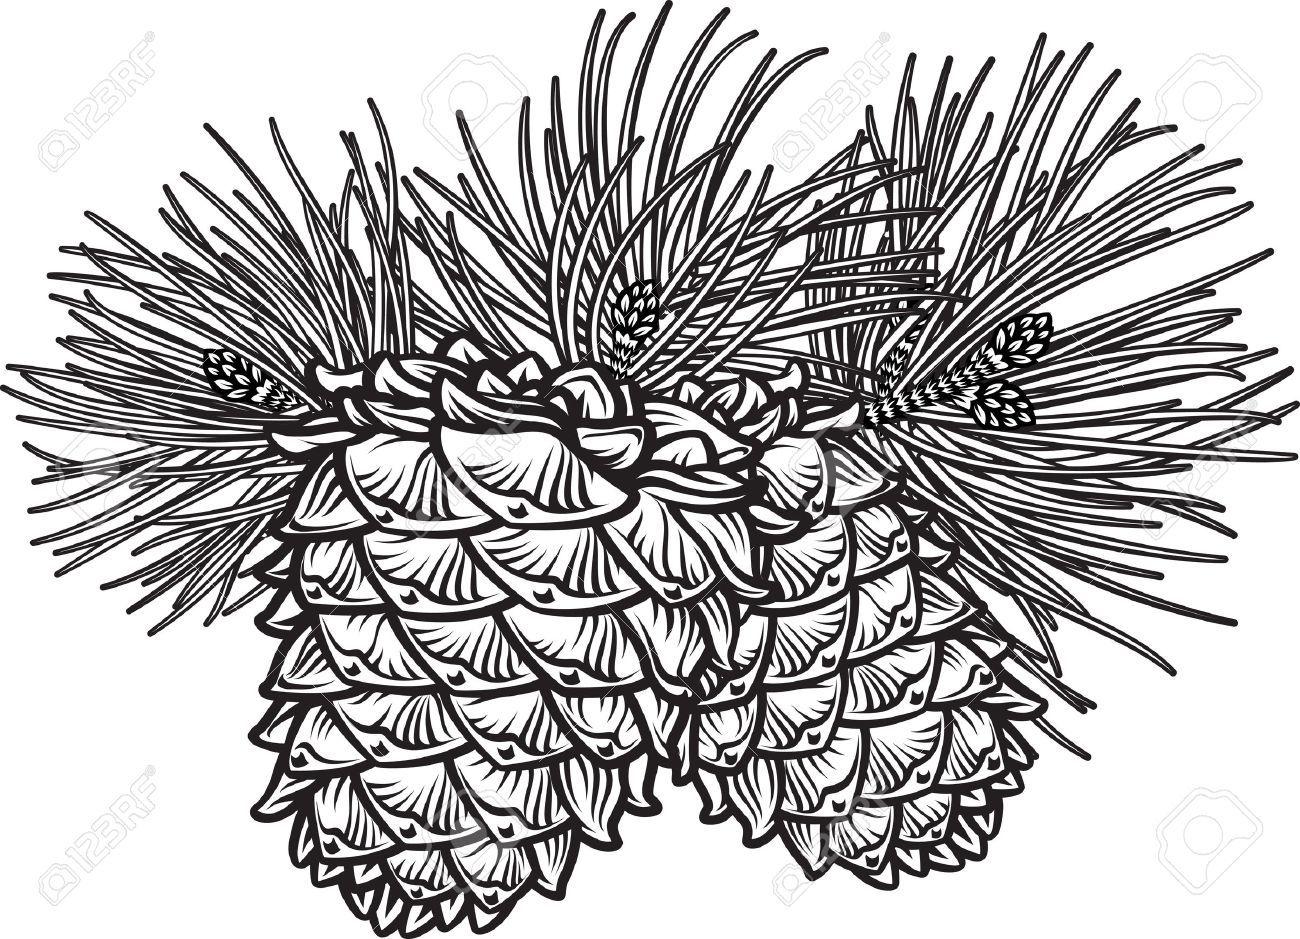 Pinecone clipart black and white 2 » Clipart Portal.